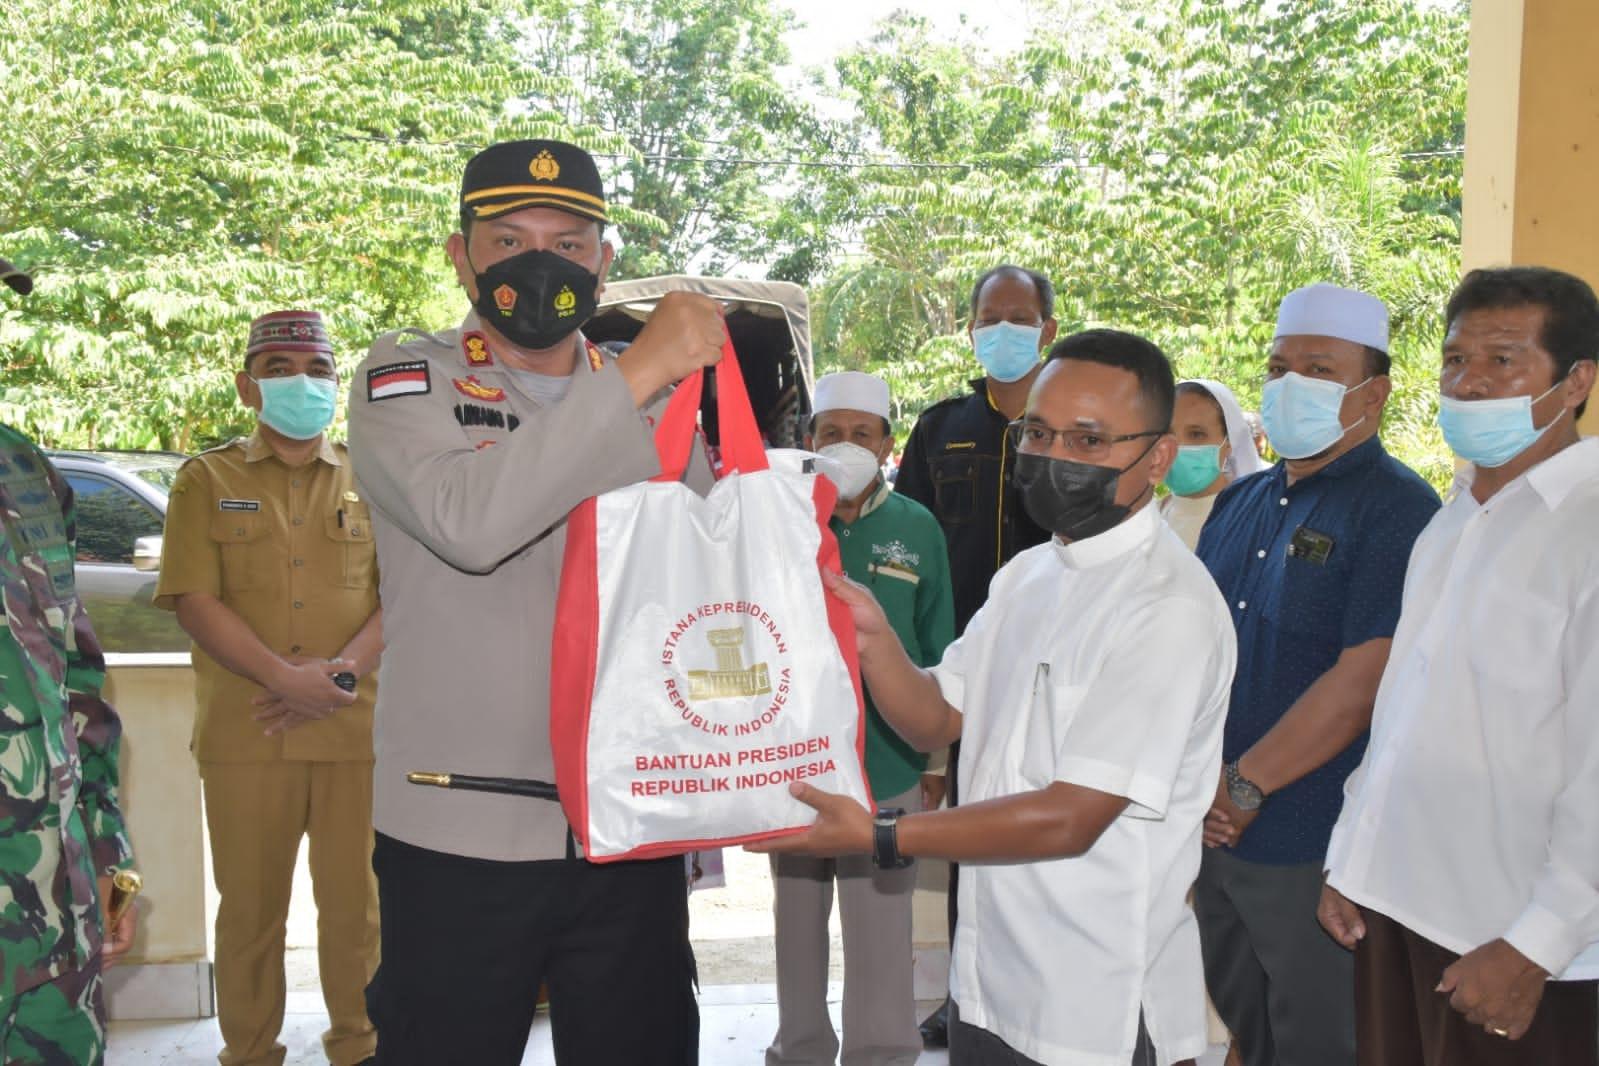 Kapolres Manggarai Barat bersama Forkopimda serahkan bantuan Presiden RI melalui tokoh agama